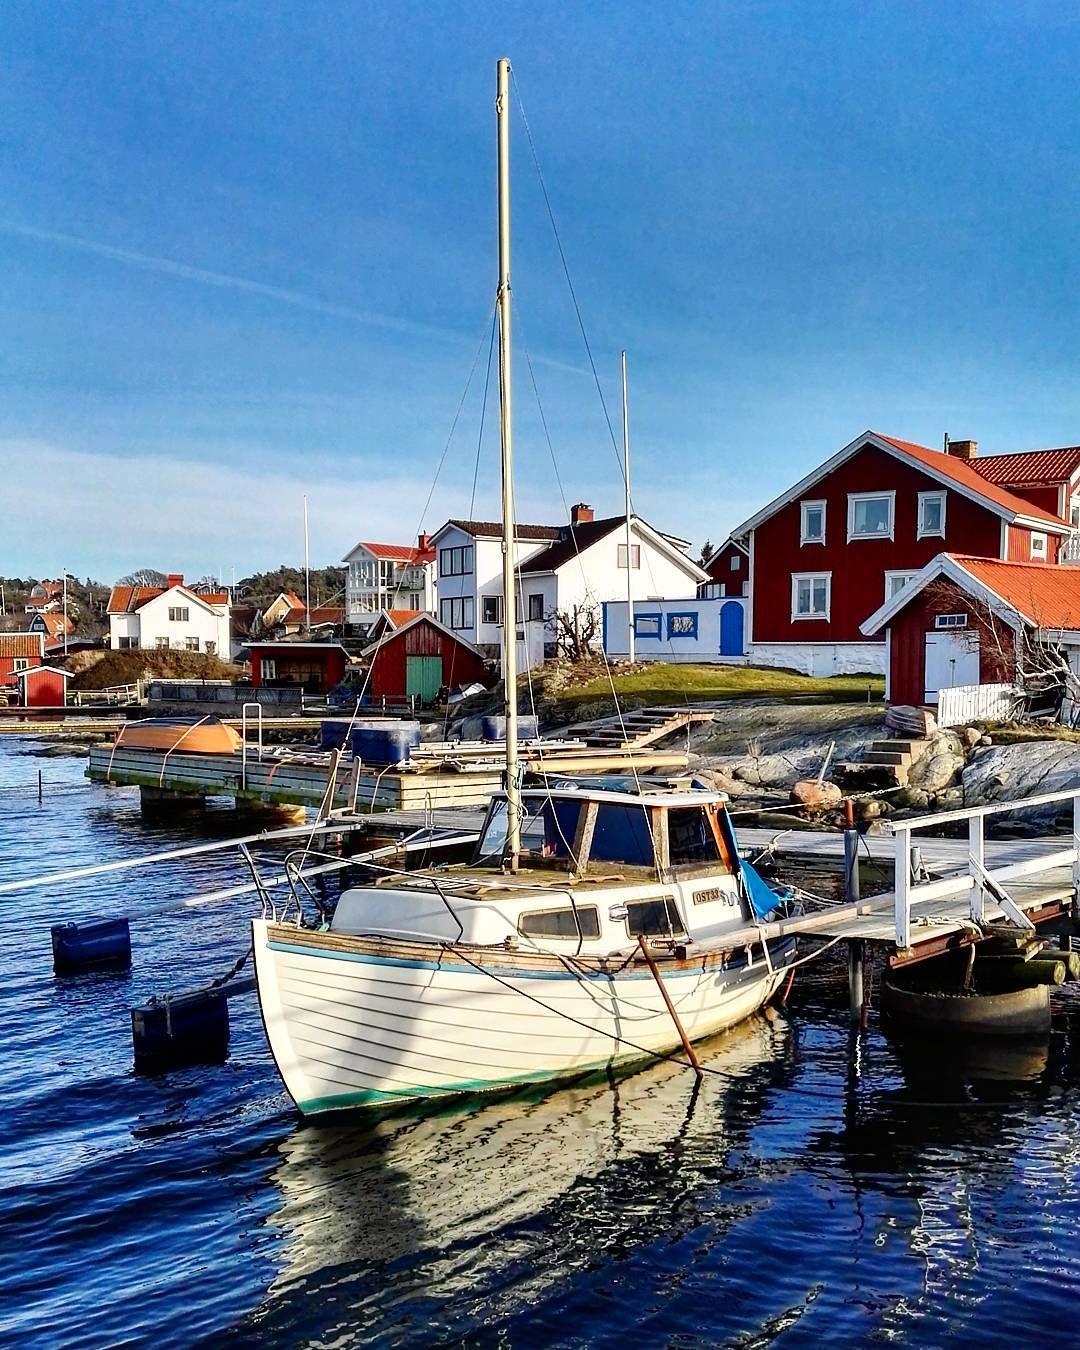 #styrsö #gotheborg #goteborg #sweden #svezia #sea #landscape #landscape_captures #landscape_lovers #sail #sailing #sailboat #blue #trip #holiday #vacation #freetime #nofilter #nofilterneeded #village by marcodiv_910